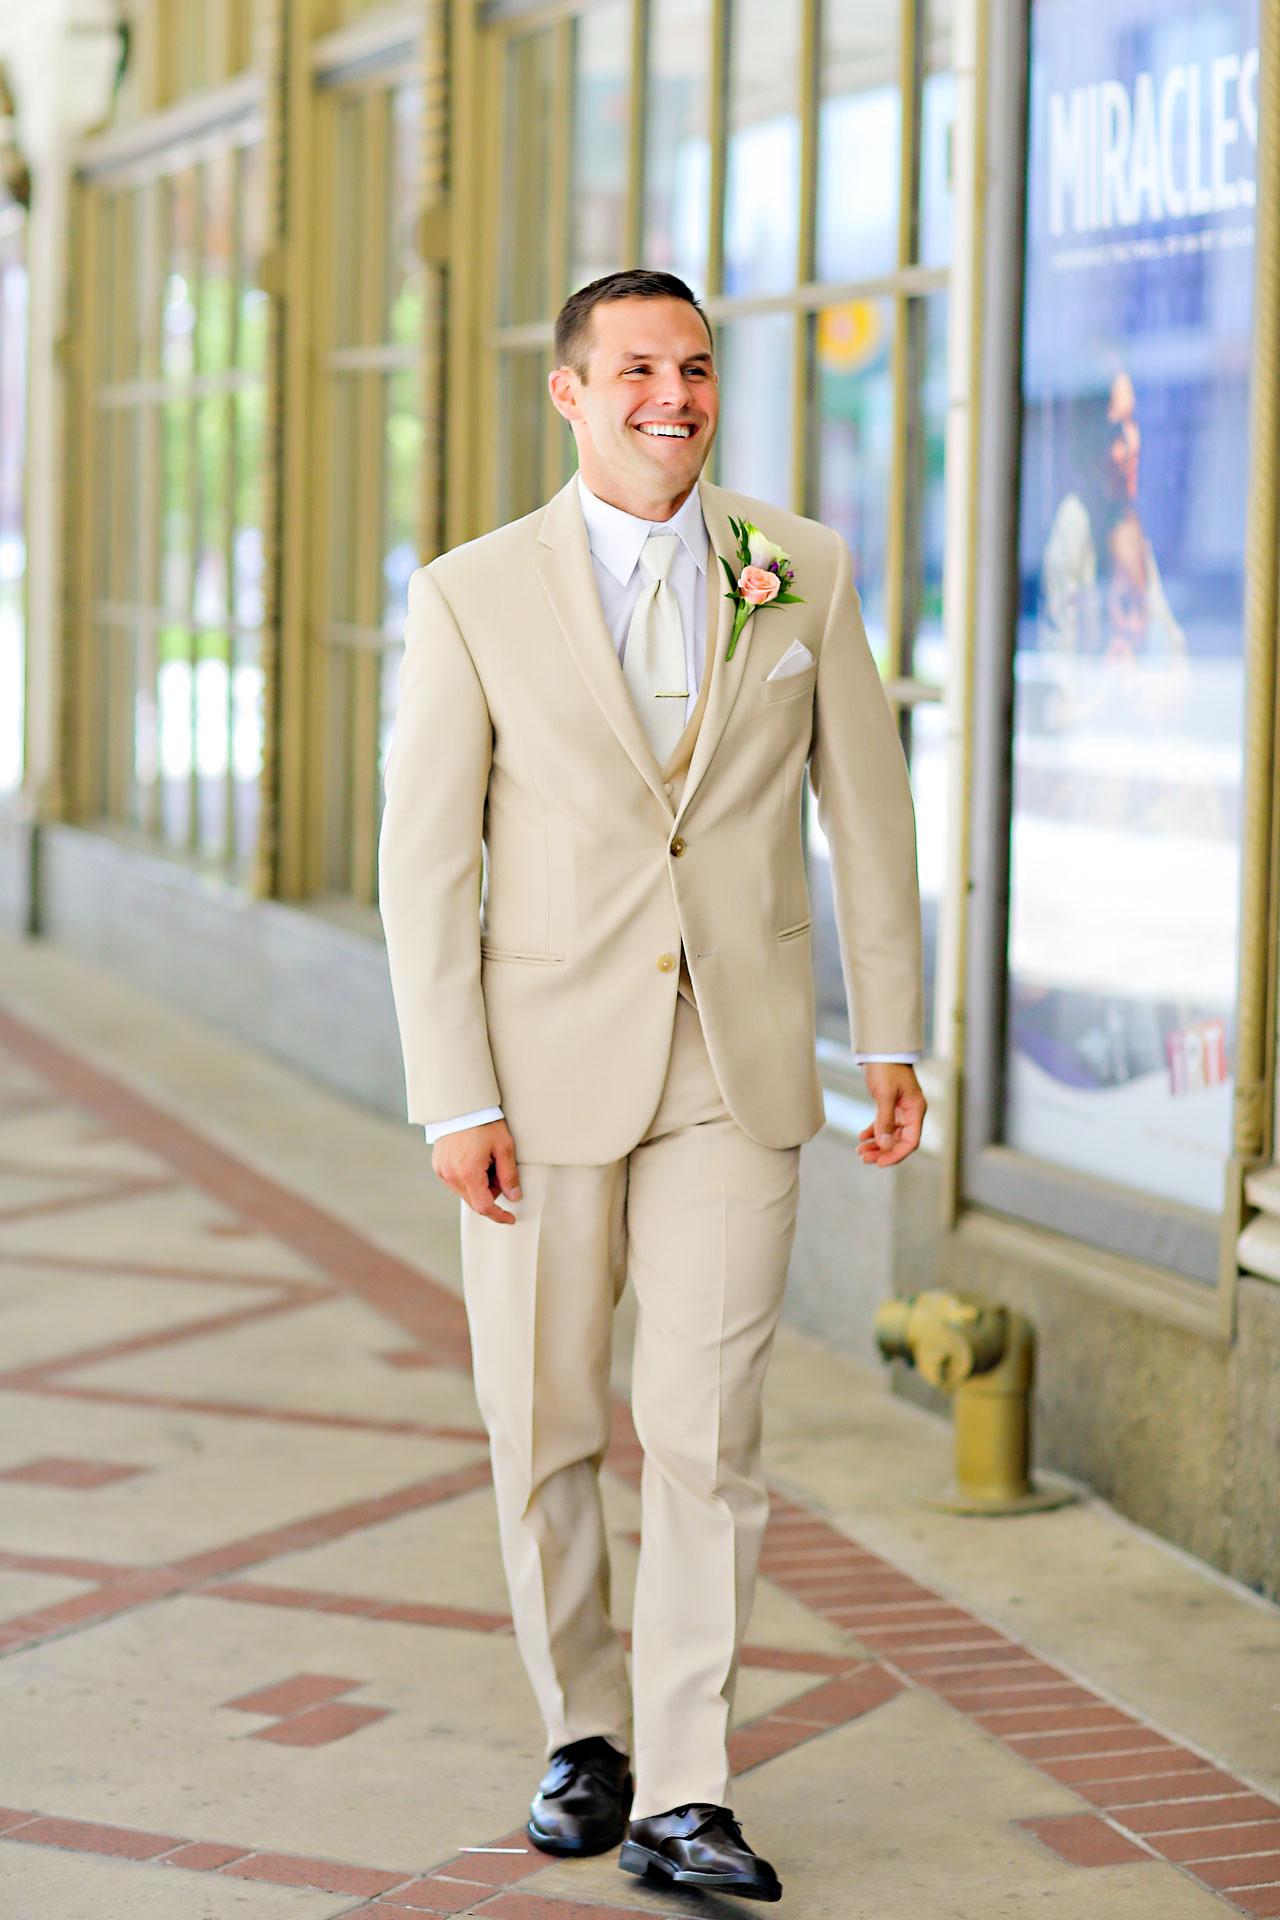 Chandra Kevin Indiana Roof Ballroom wedding 0058